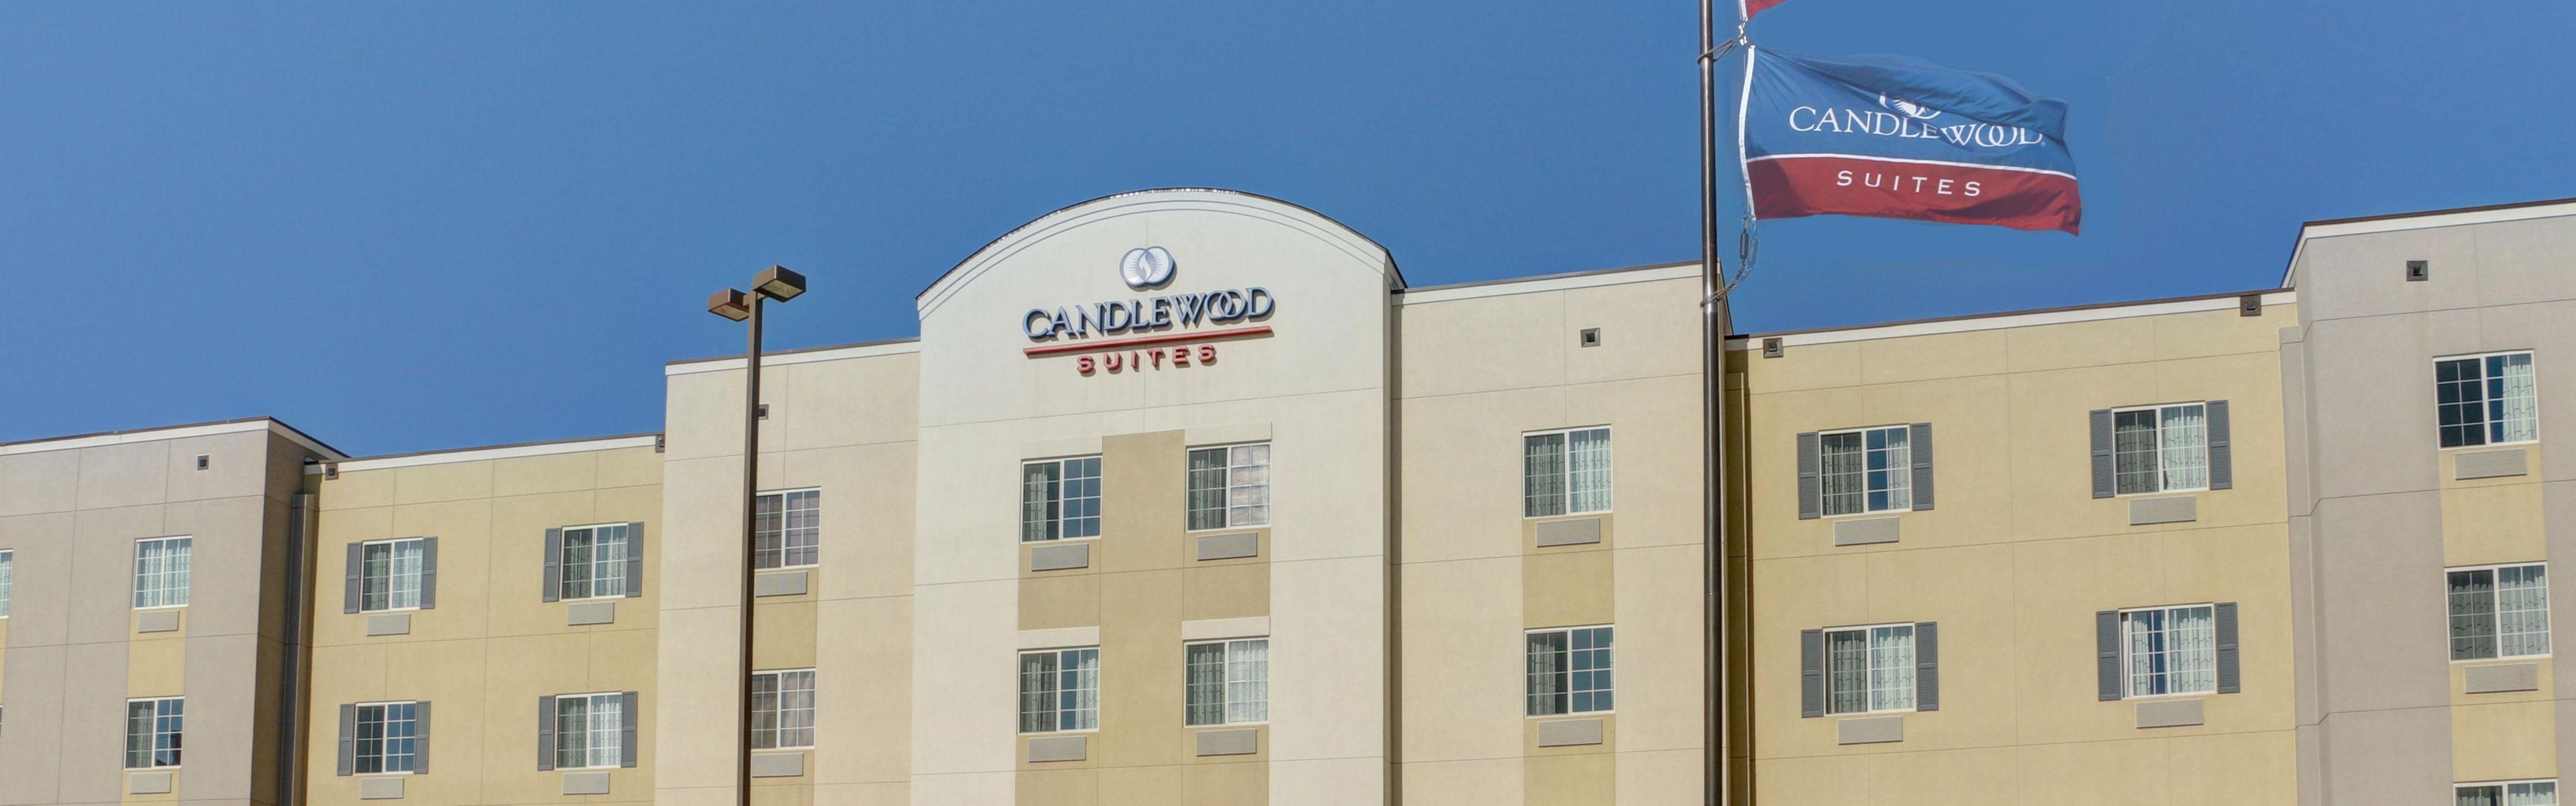 Candlewood Suites Texarkana image 0